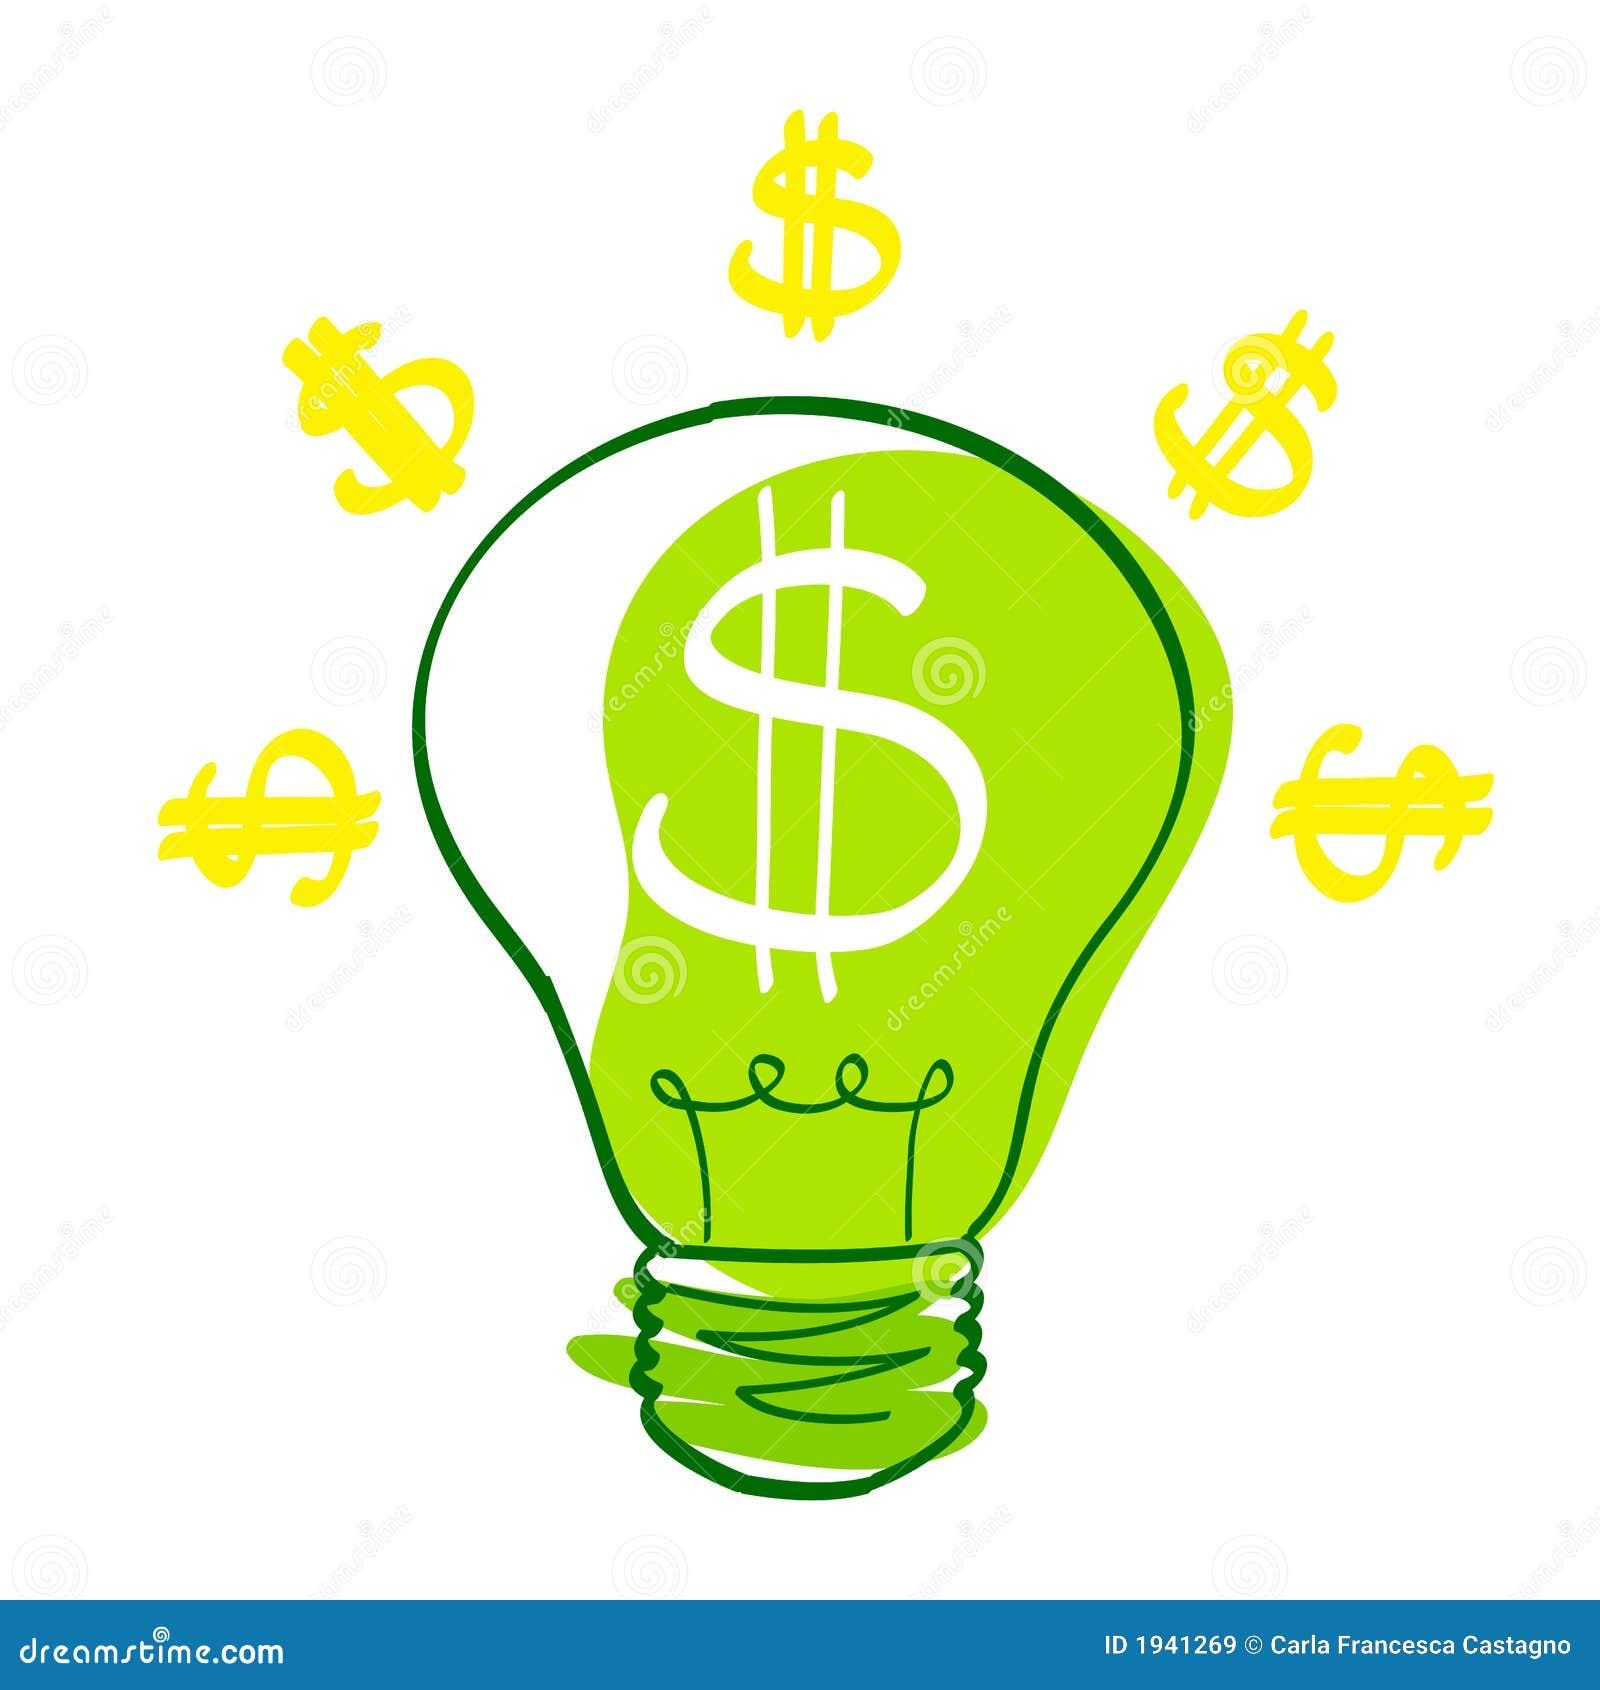 Dollar Icon Vector A bulb with dollar symbolDollar Bill Icon Vector